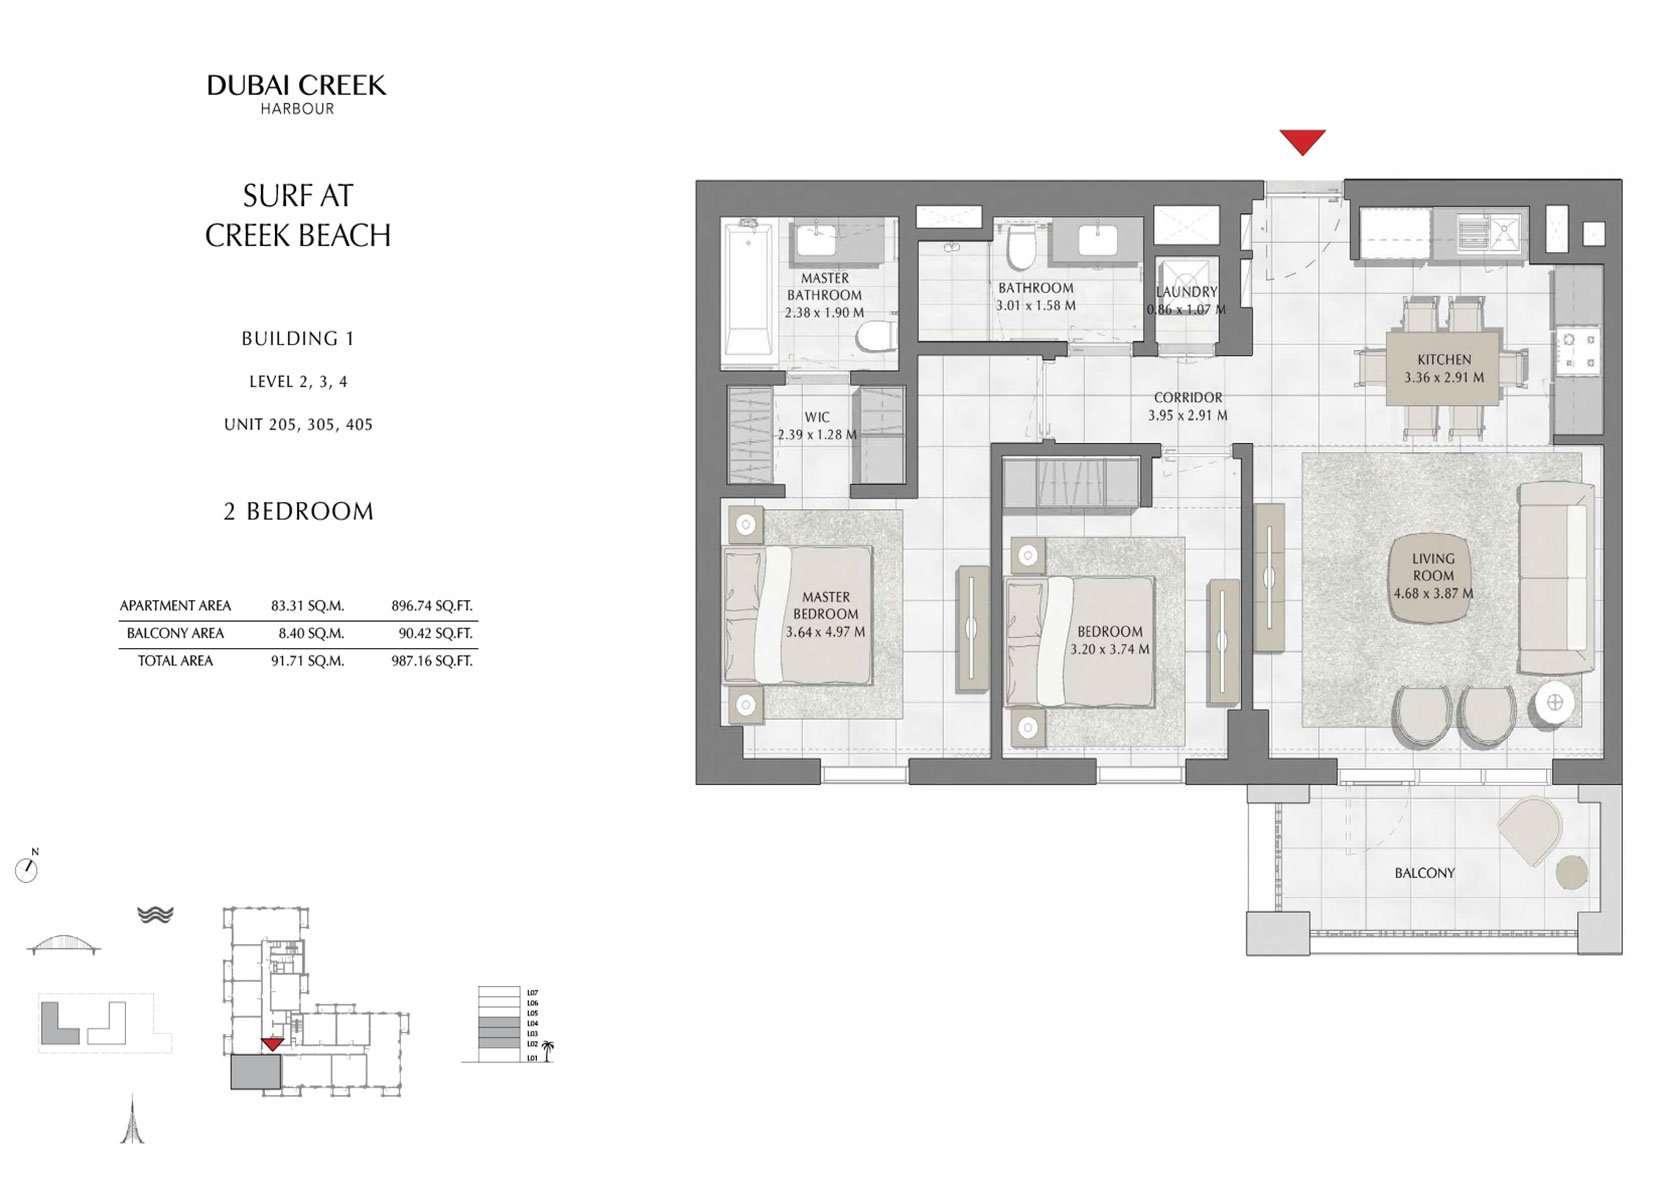 2-Bedroom Apartment Dubai Creek Beach - Surf Einheiten 205, 305, 405